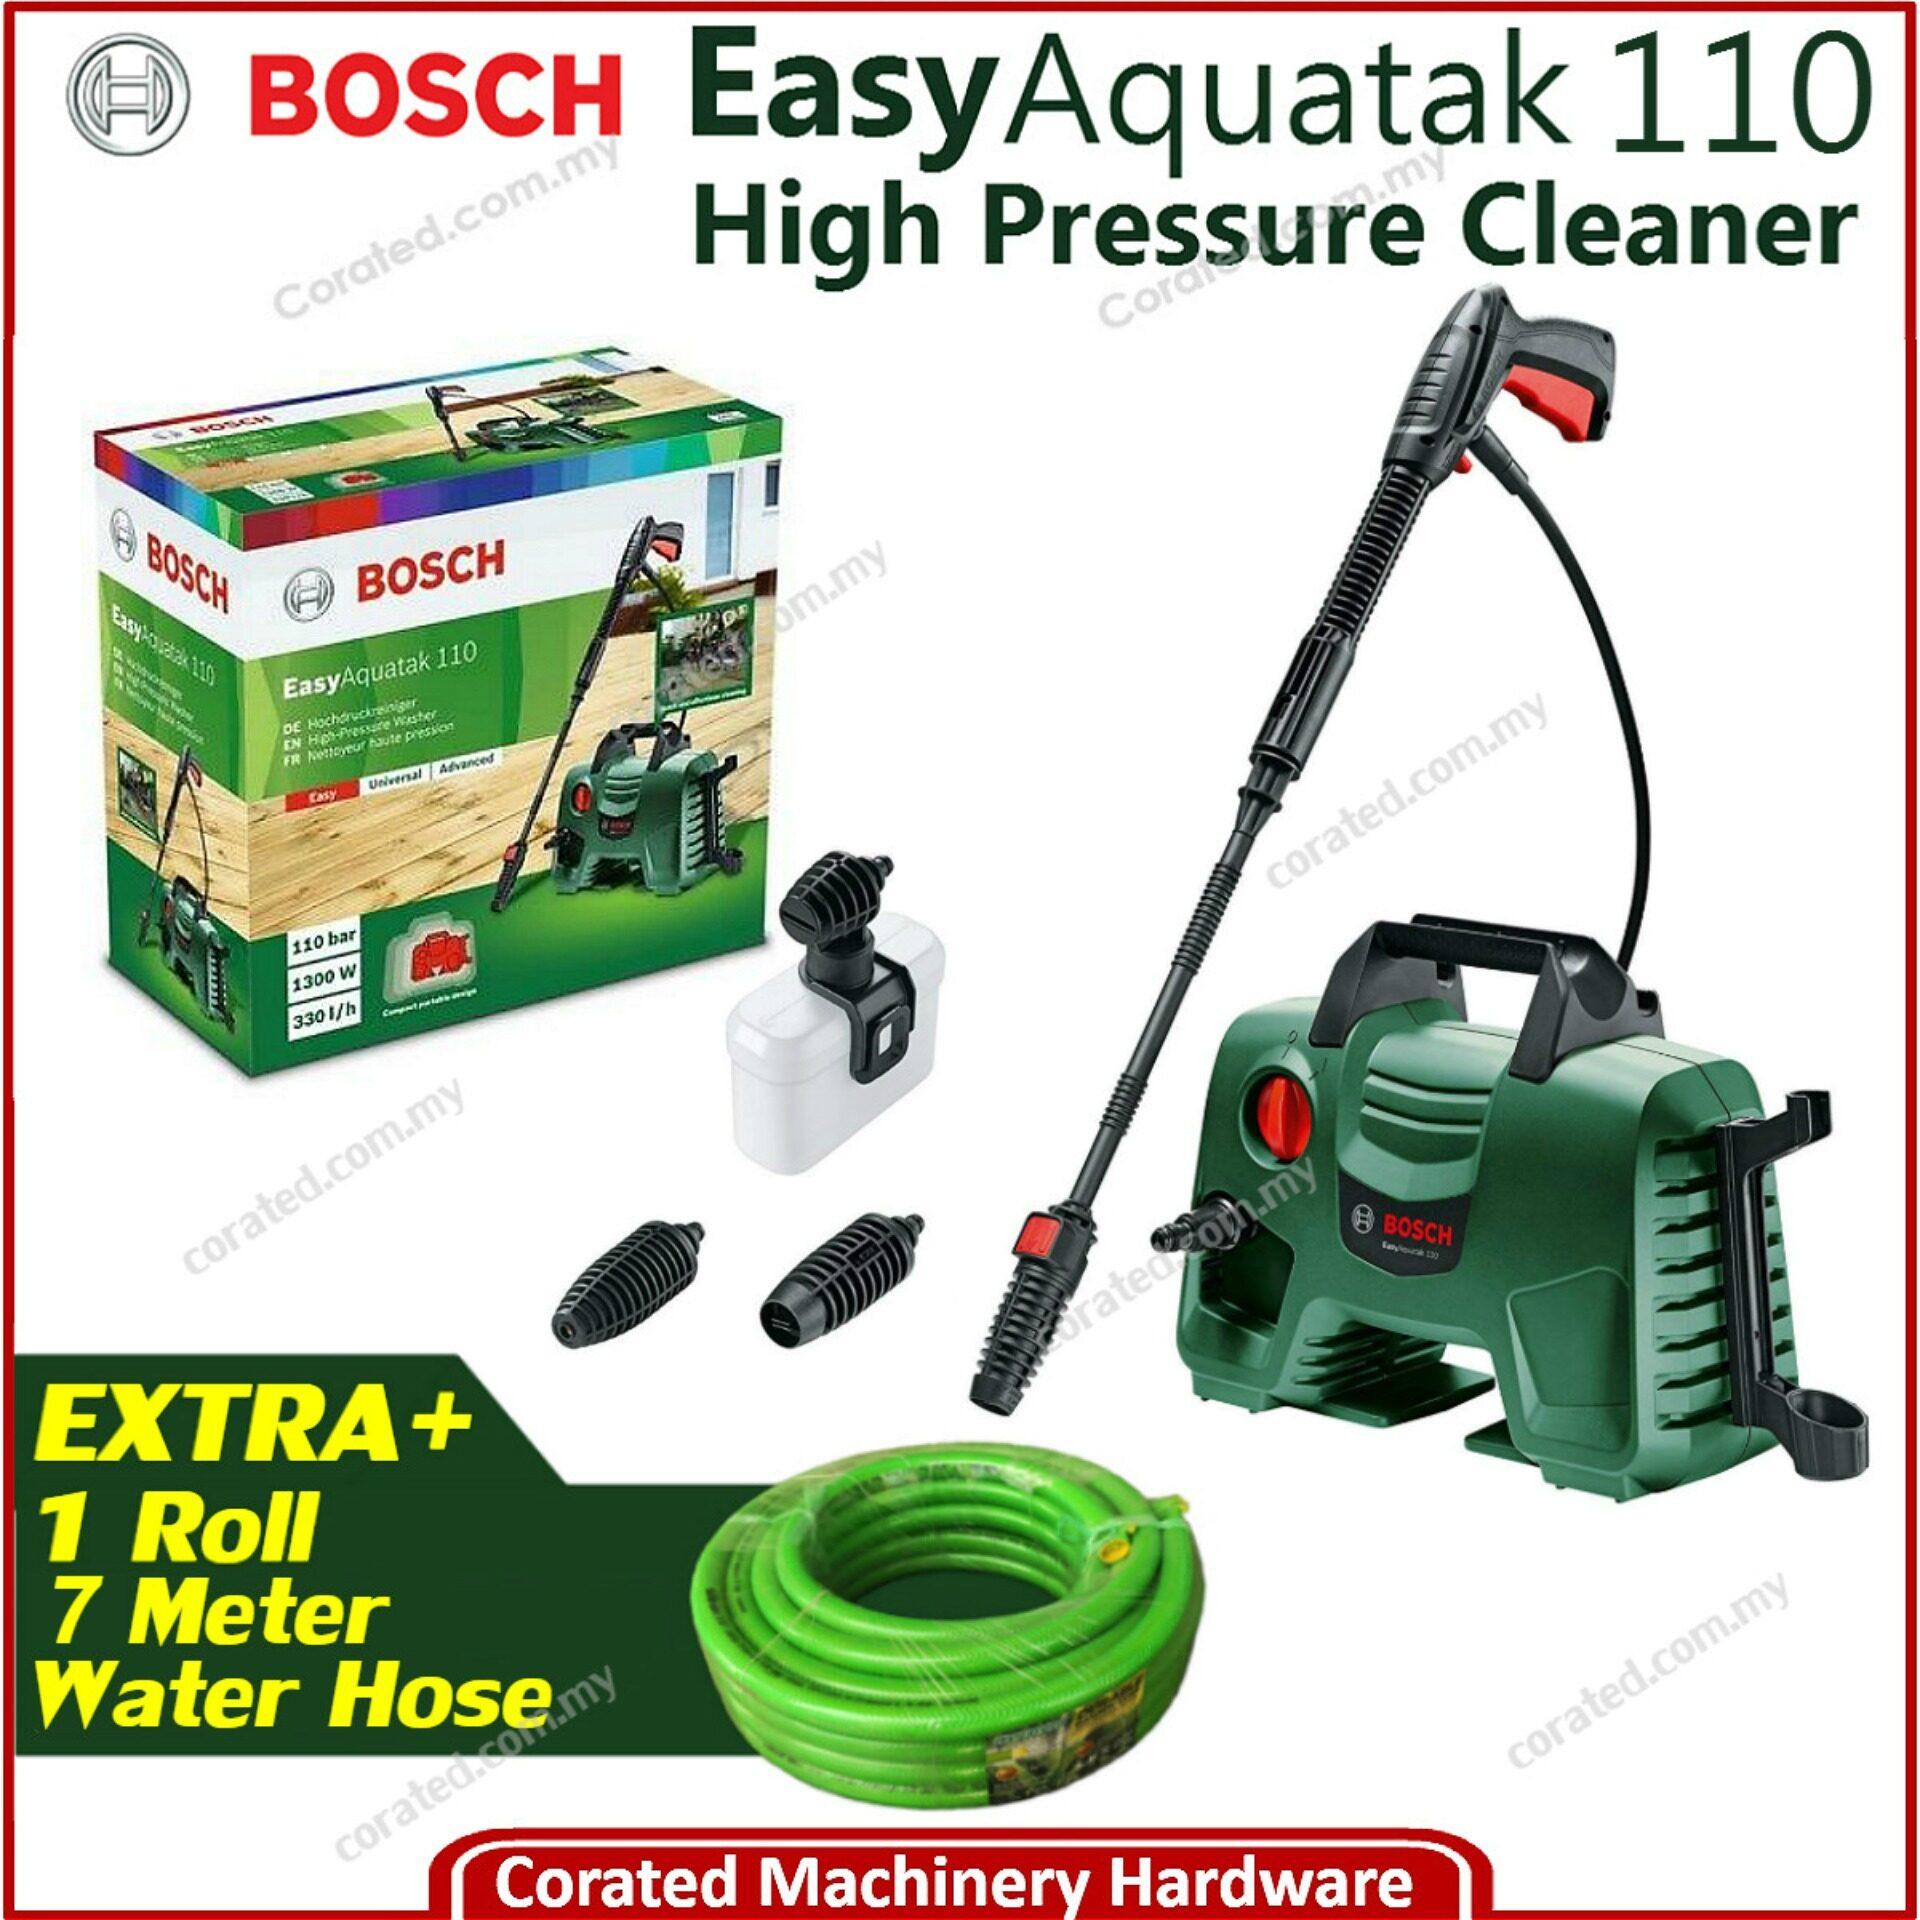 [CORATED] Bosch Aquatak 110 (110 Bar) High Pressure Cleaner(6 Months Warranty) Aquatak110 Easyaquatak 110